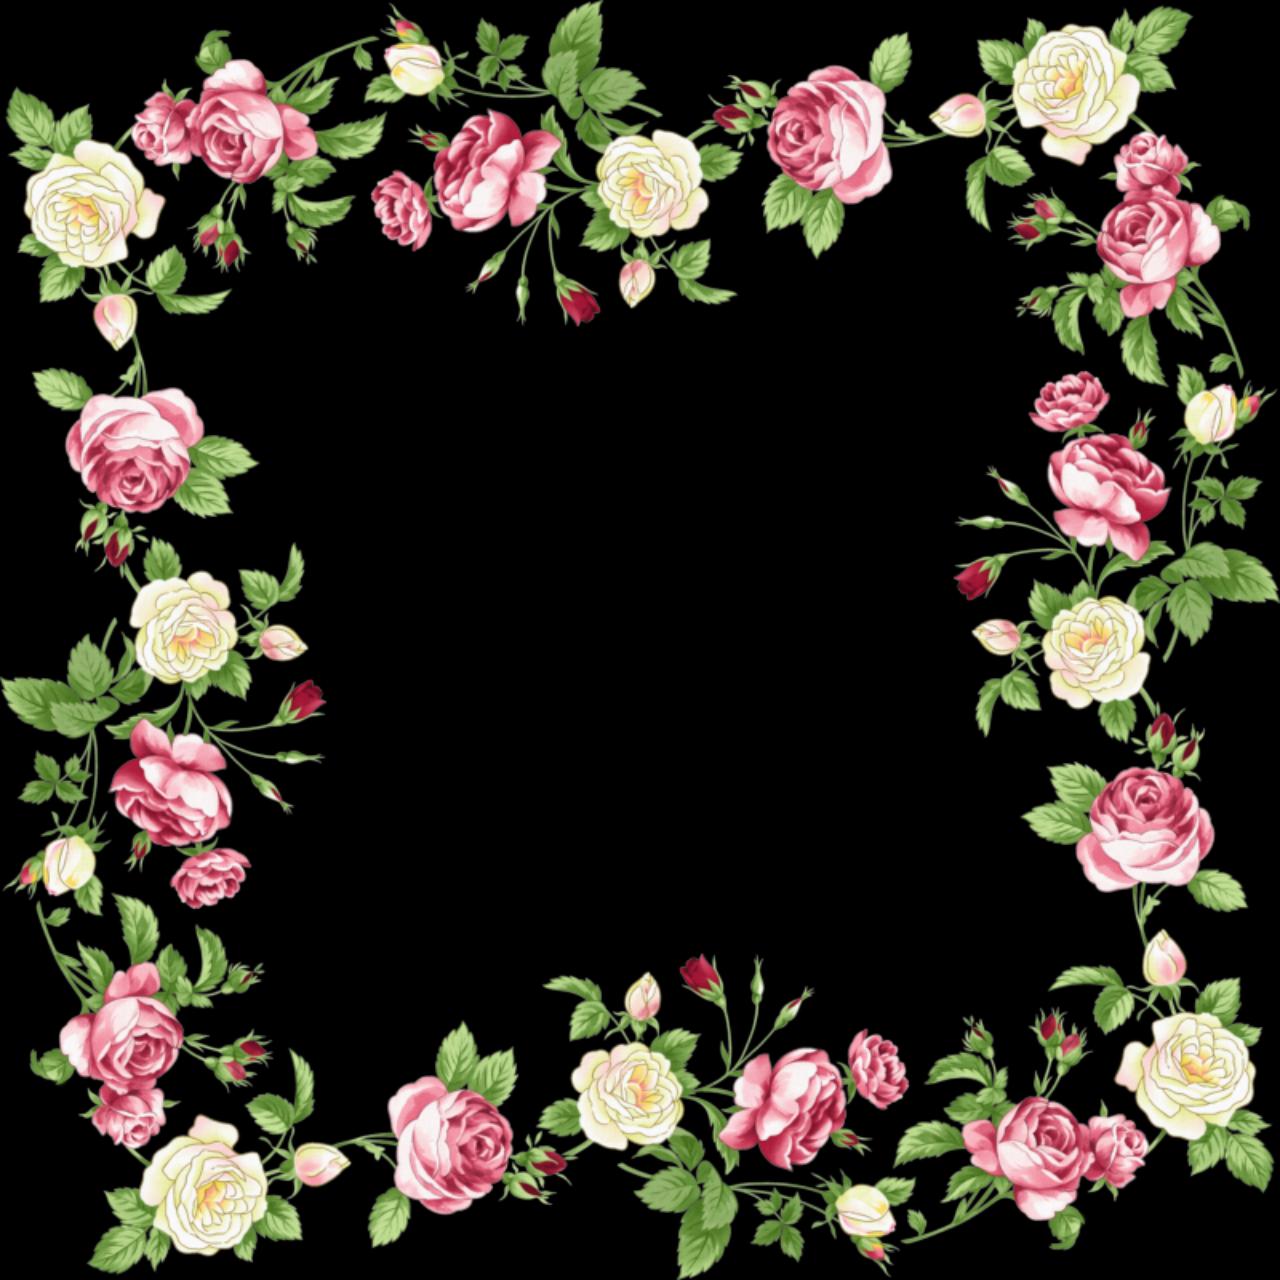 Flowers Borders PNG - 15476